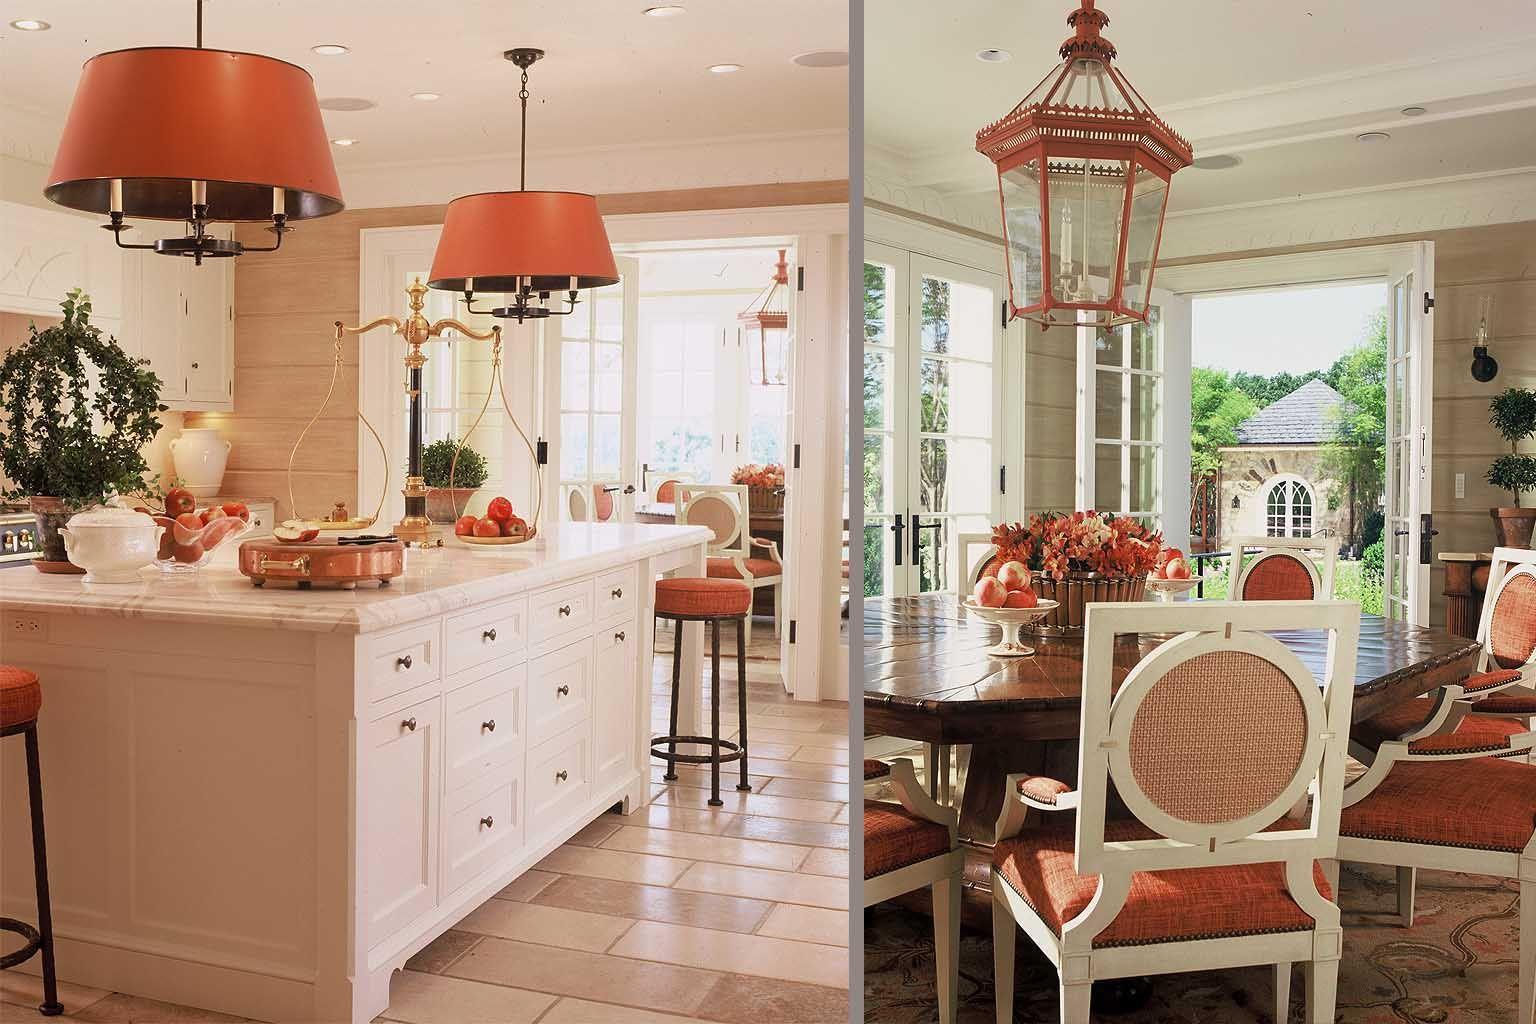 Charles Edwareds Large Hanging Tole Shade Lights On Left Turner - Kitchenette lighting